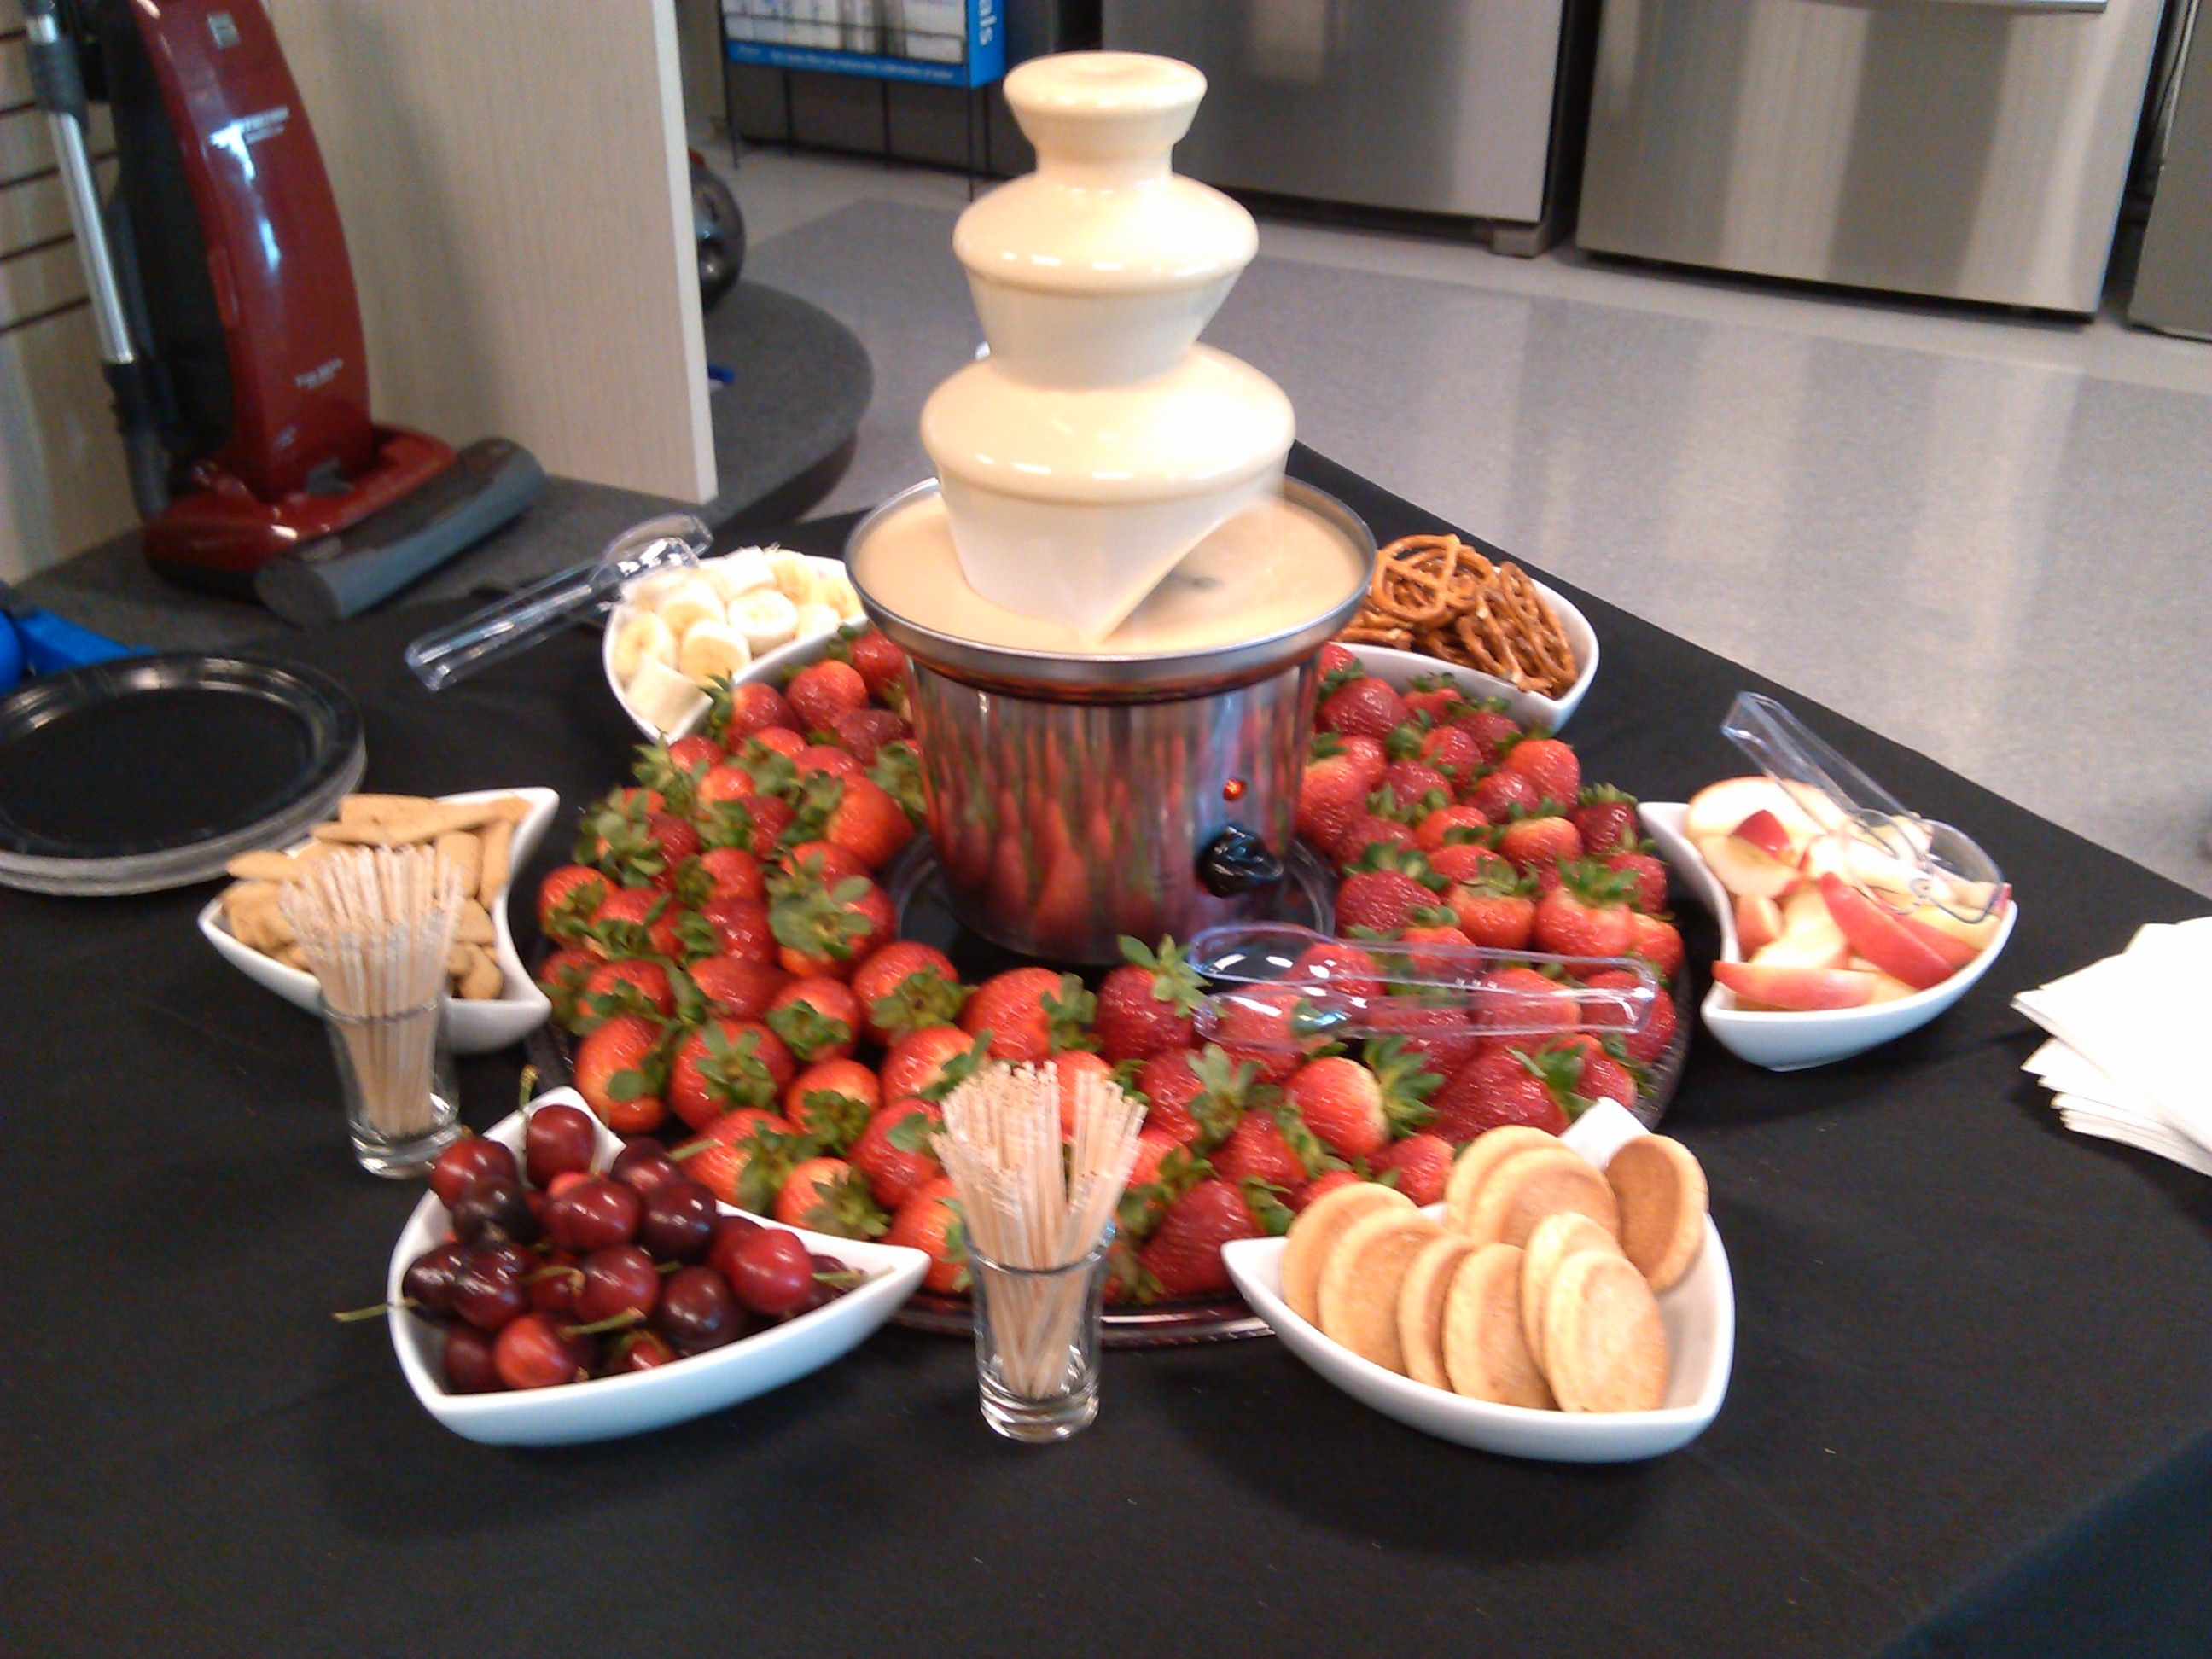 Best 25+ Chocolate fountain foods ideas on Pinterest ... |Chocolate Fountain Ideas